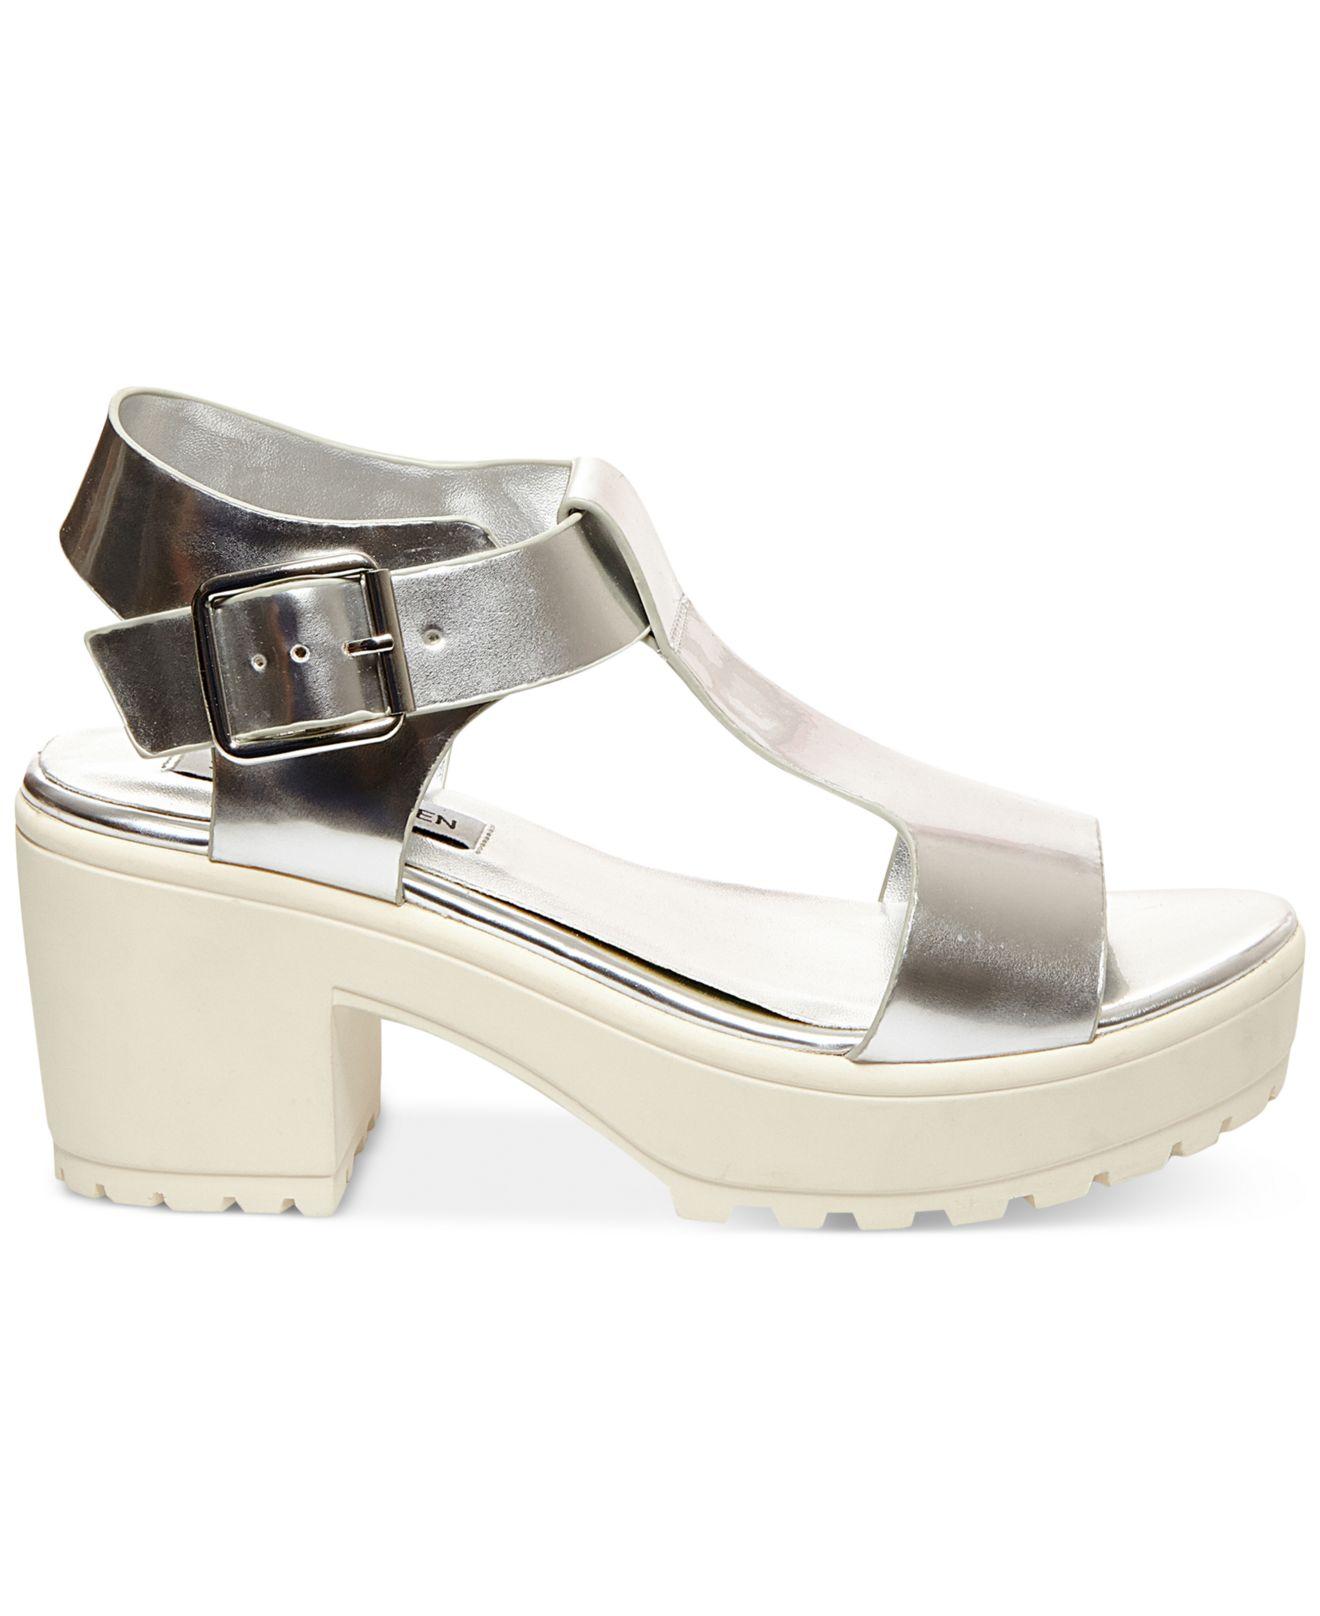 812d24ede83 Lyst - Steve Madden Women S Stefano Block Heel Platform Sandals in ...